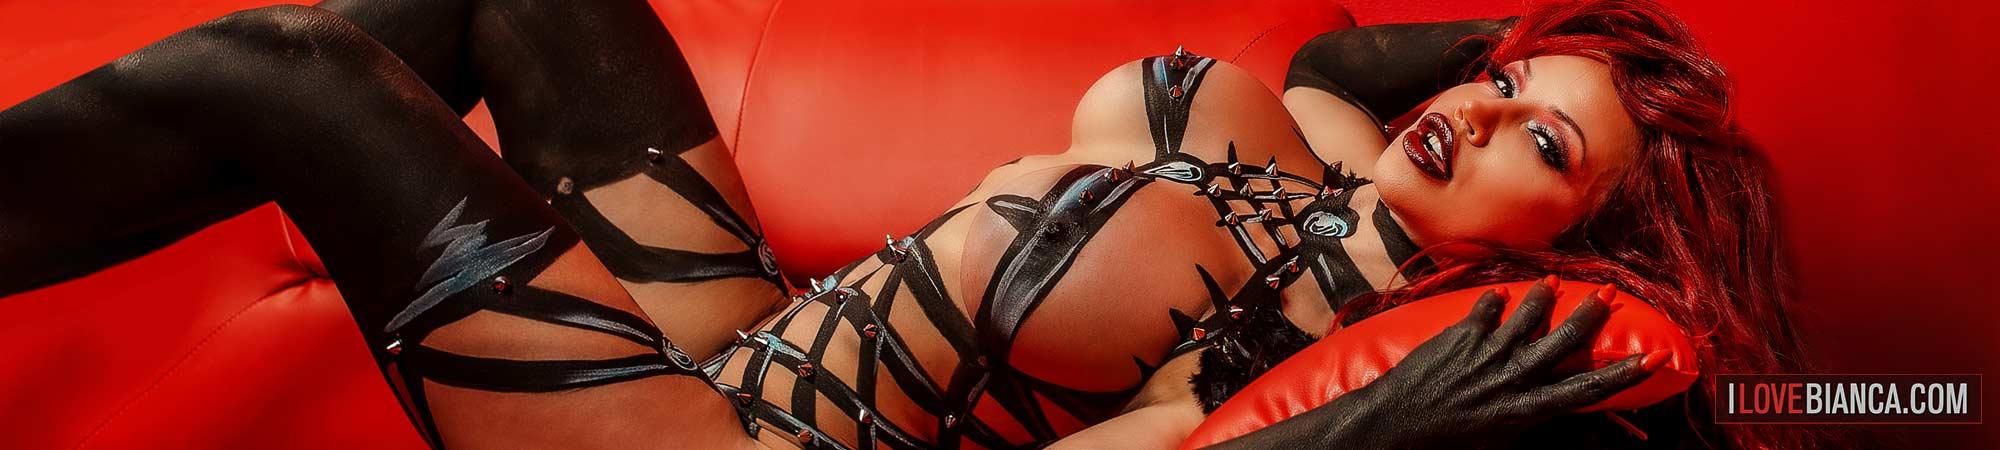 Bianca Beauchamp Official Website : Latex, Glam, Lingerie Photos + Videos